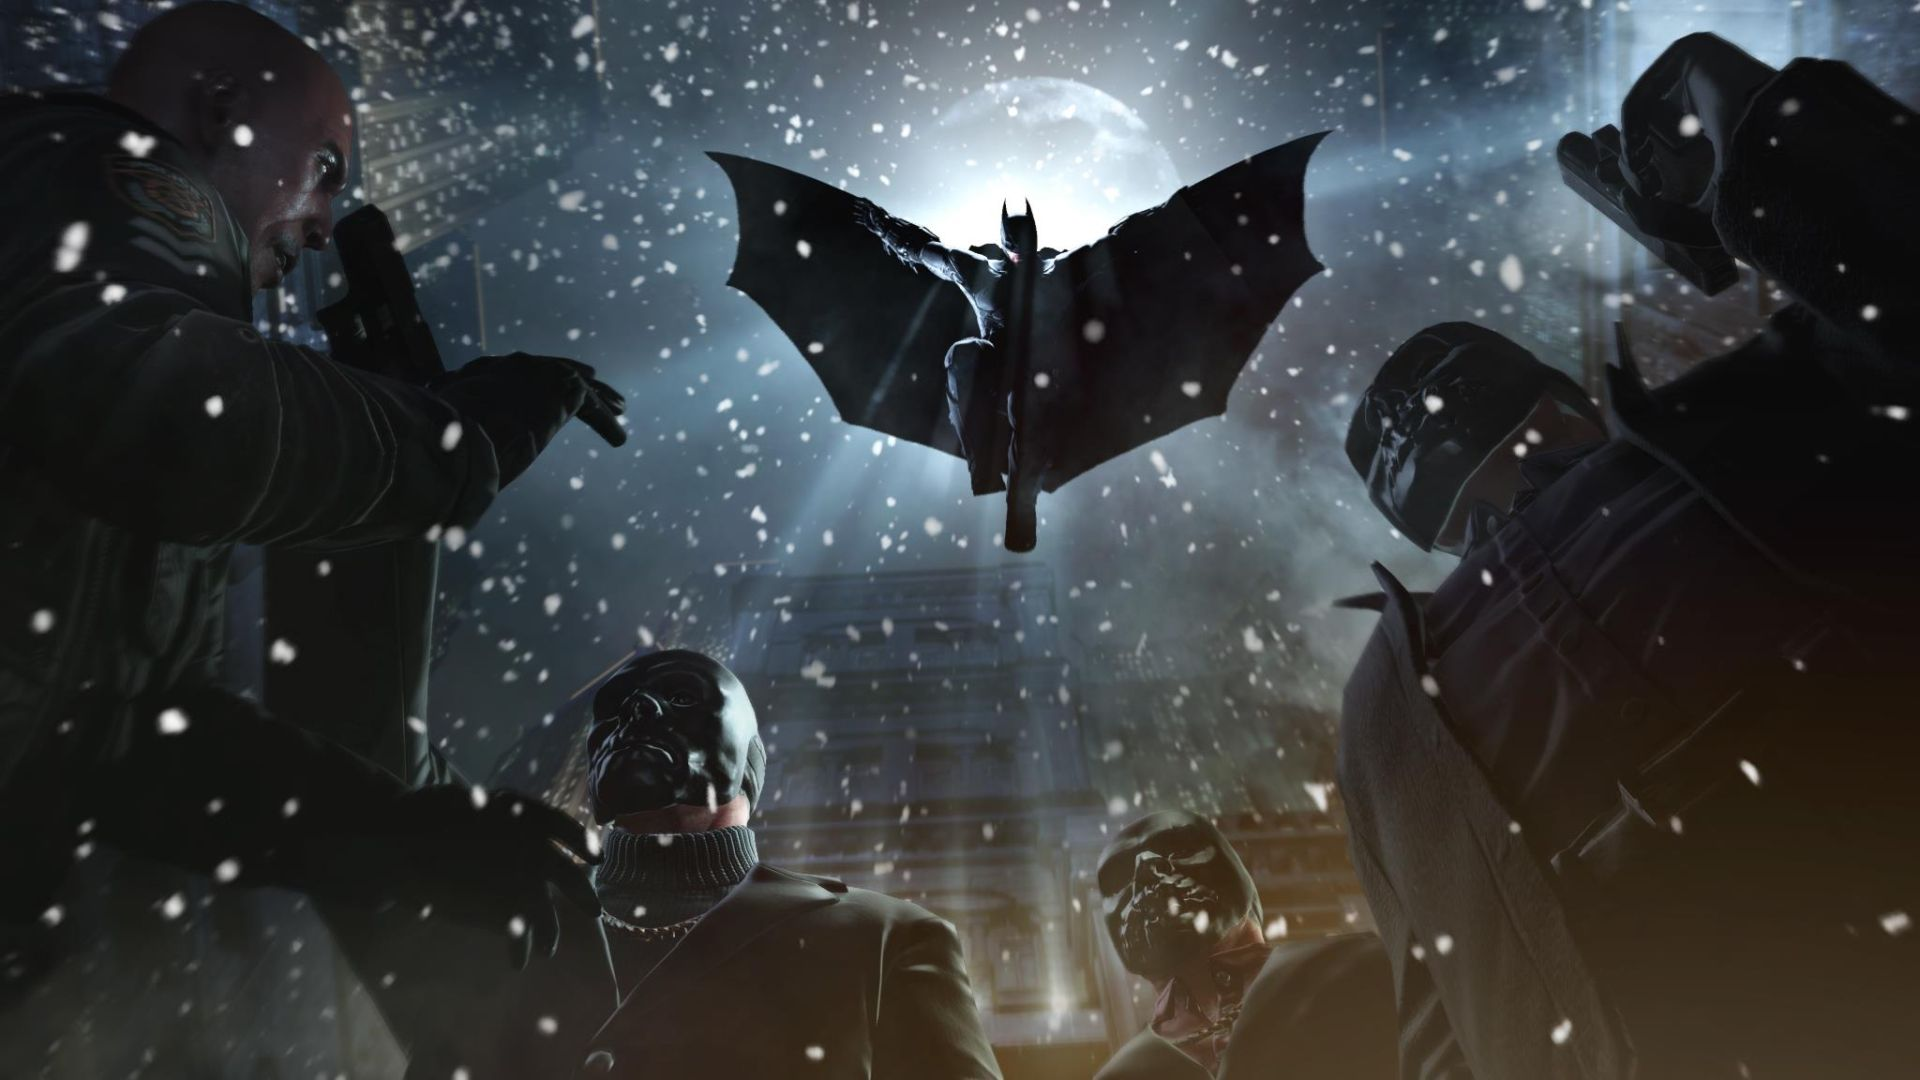 Batman-Arkham-Origins-Gets-Brand-New-Screenshots-and-Artwork-2